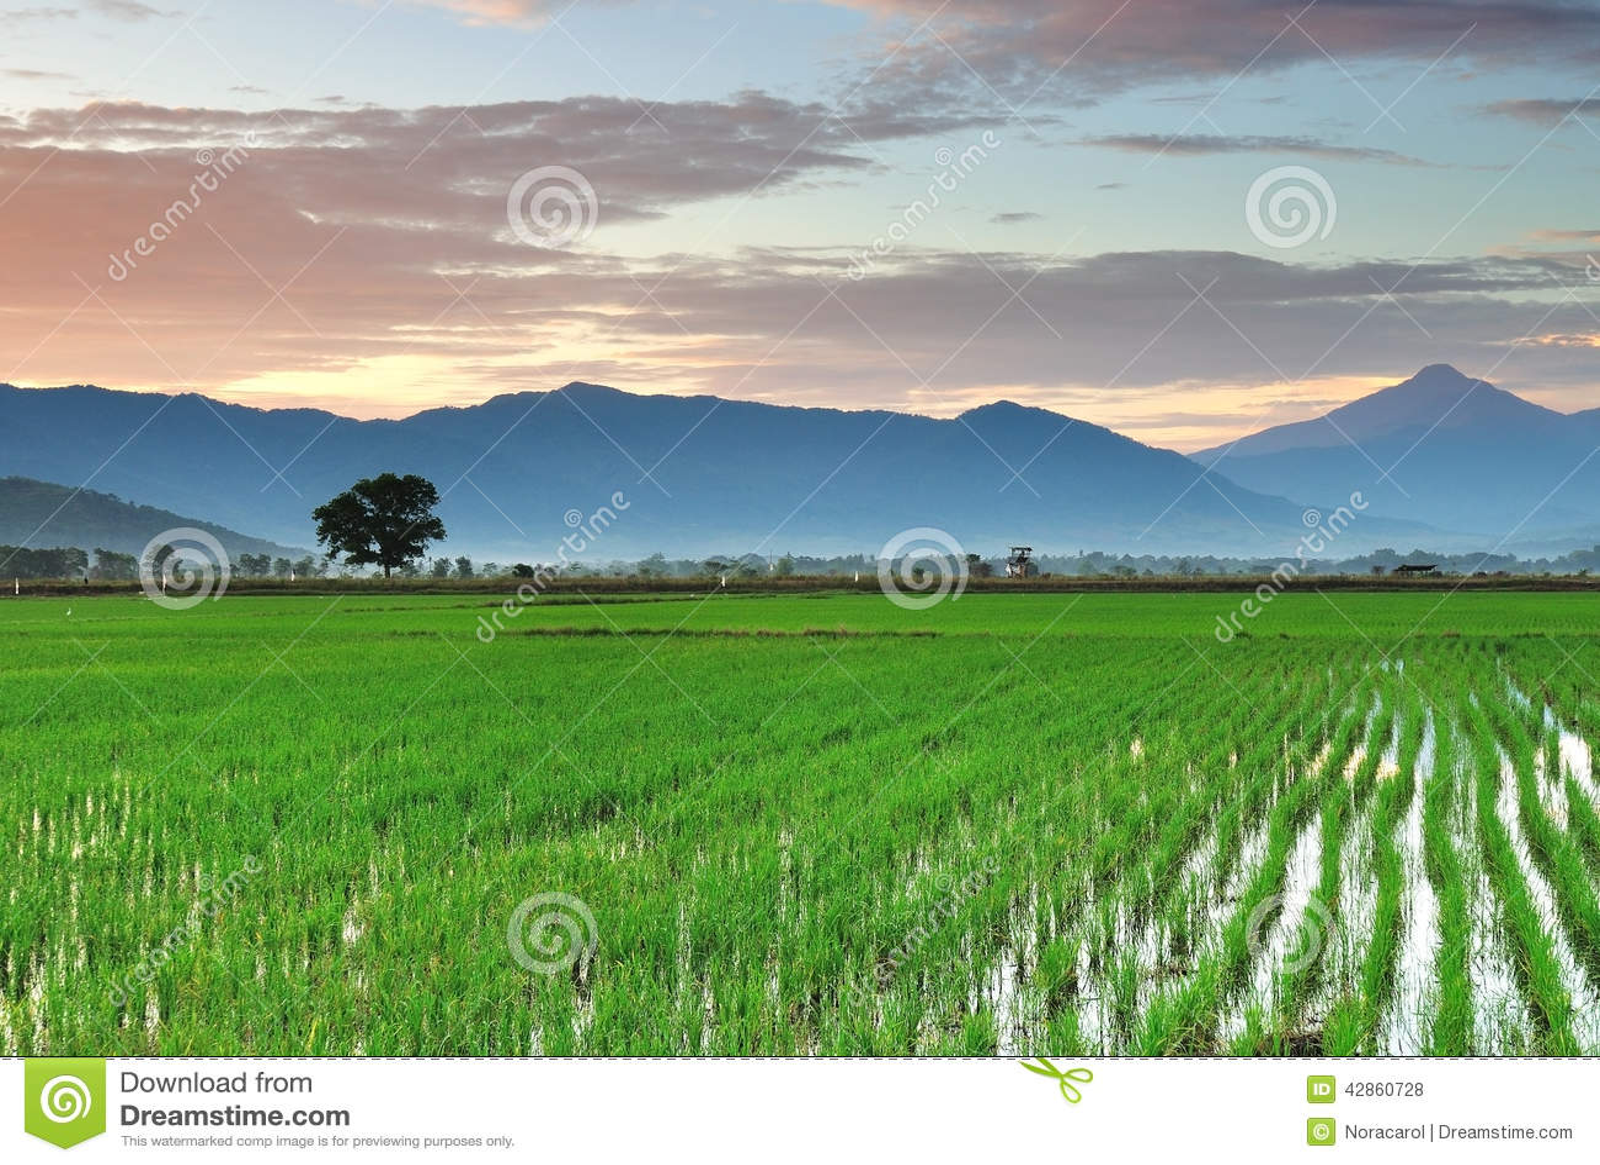 Kota Belud Malaysia  city pictures gallery : ... over paddy field, kota belud, kota kinabalu sabah borneo malaysia